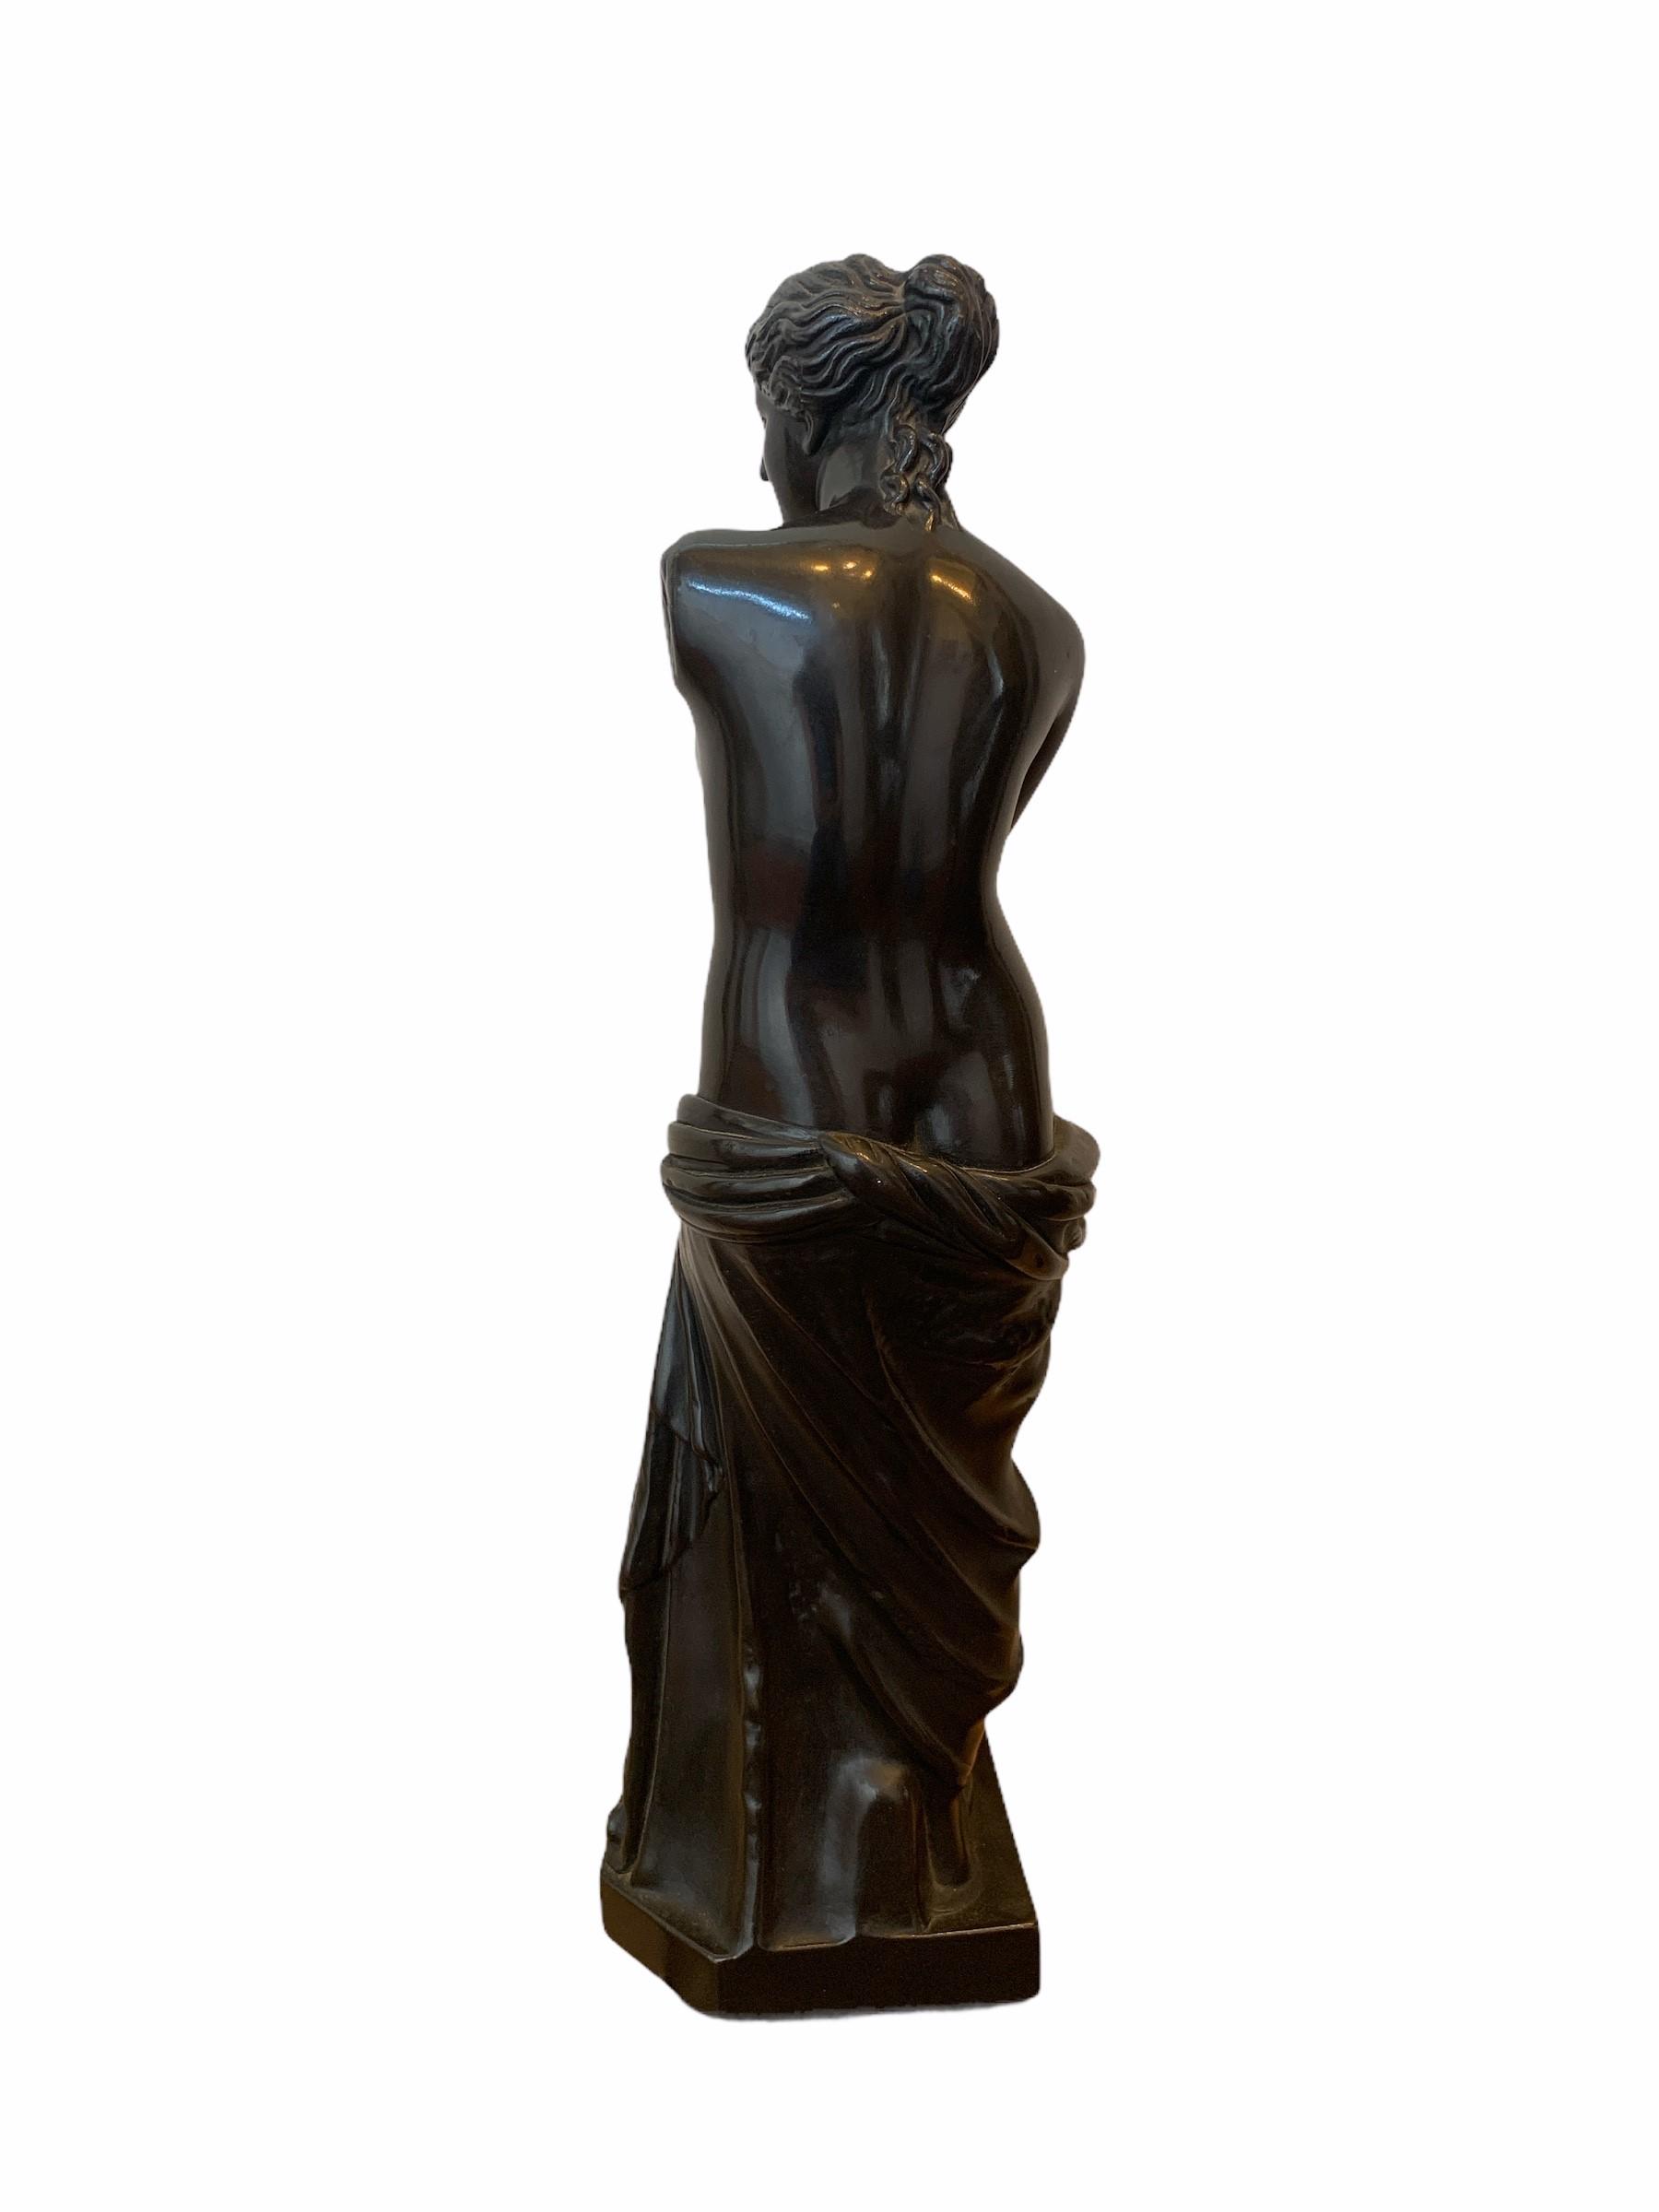 A 19TH CENTURY BRONZE CLAD STATUE OF A NEOCLASSICAL SEMINUDE FEMALE. (h 48cm x d 10.5cm x w 13cm) - Image 3 of 4